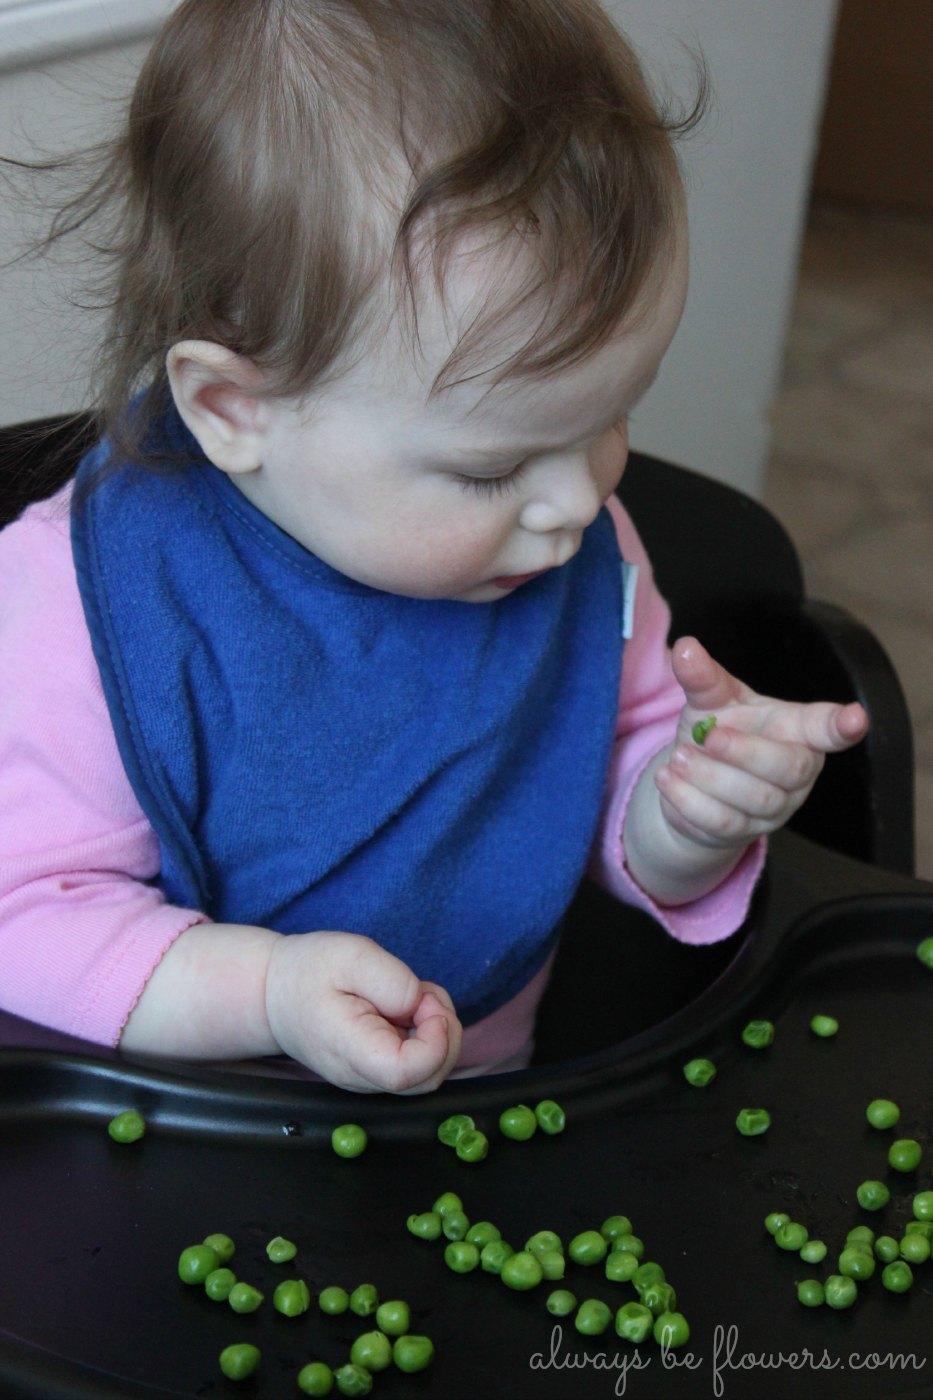 Picking up peas helps develop fine motor skills.